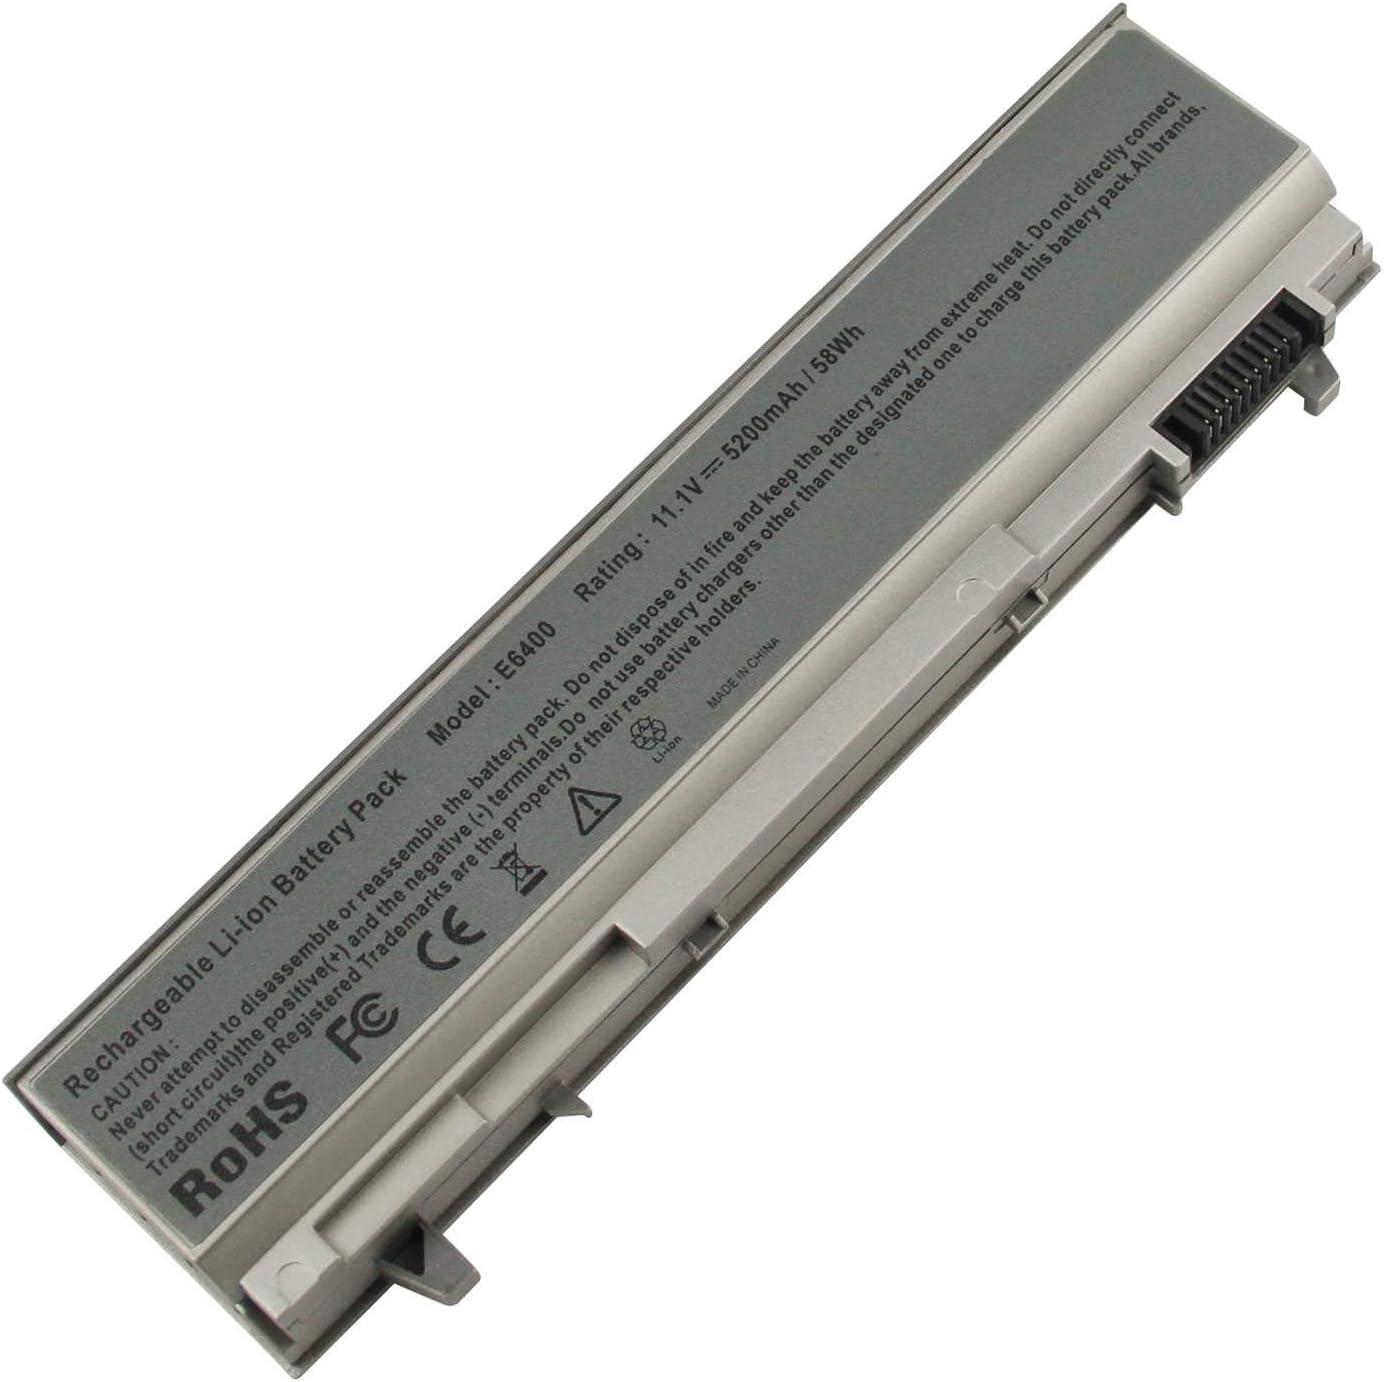 New Laptop Battery for Latitude E6400 E6410 E6500 E6510 Precision M2400 M4400 M4500 M6500